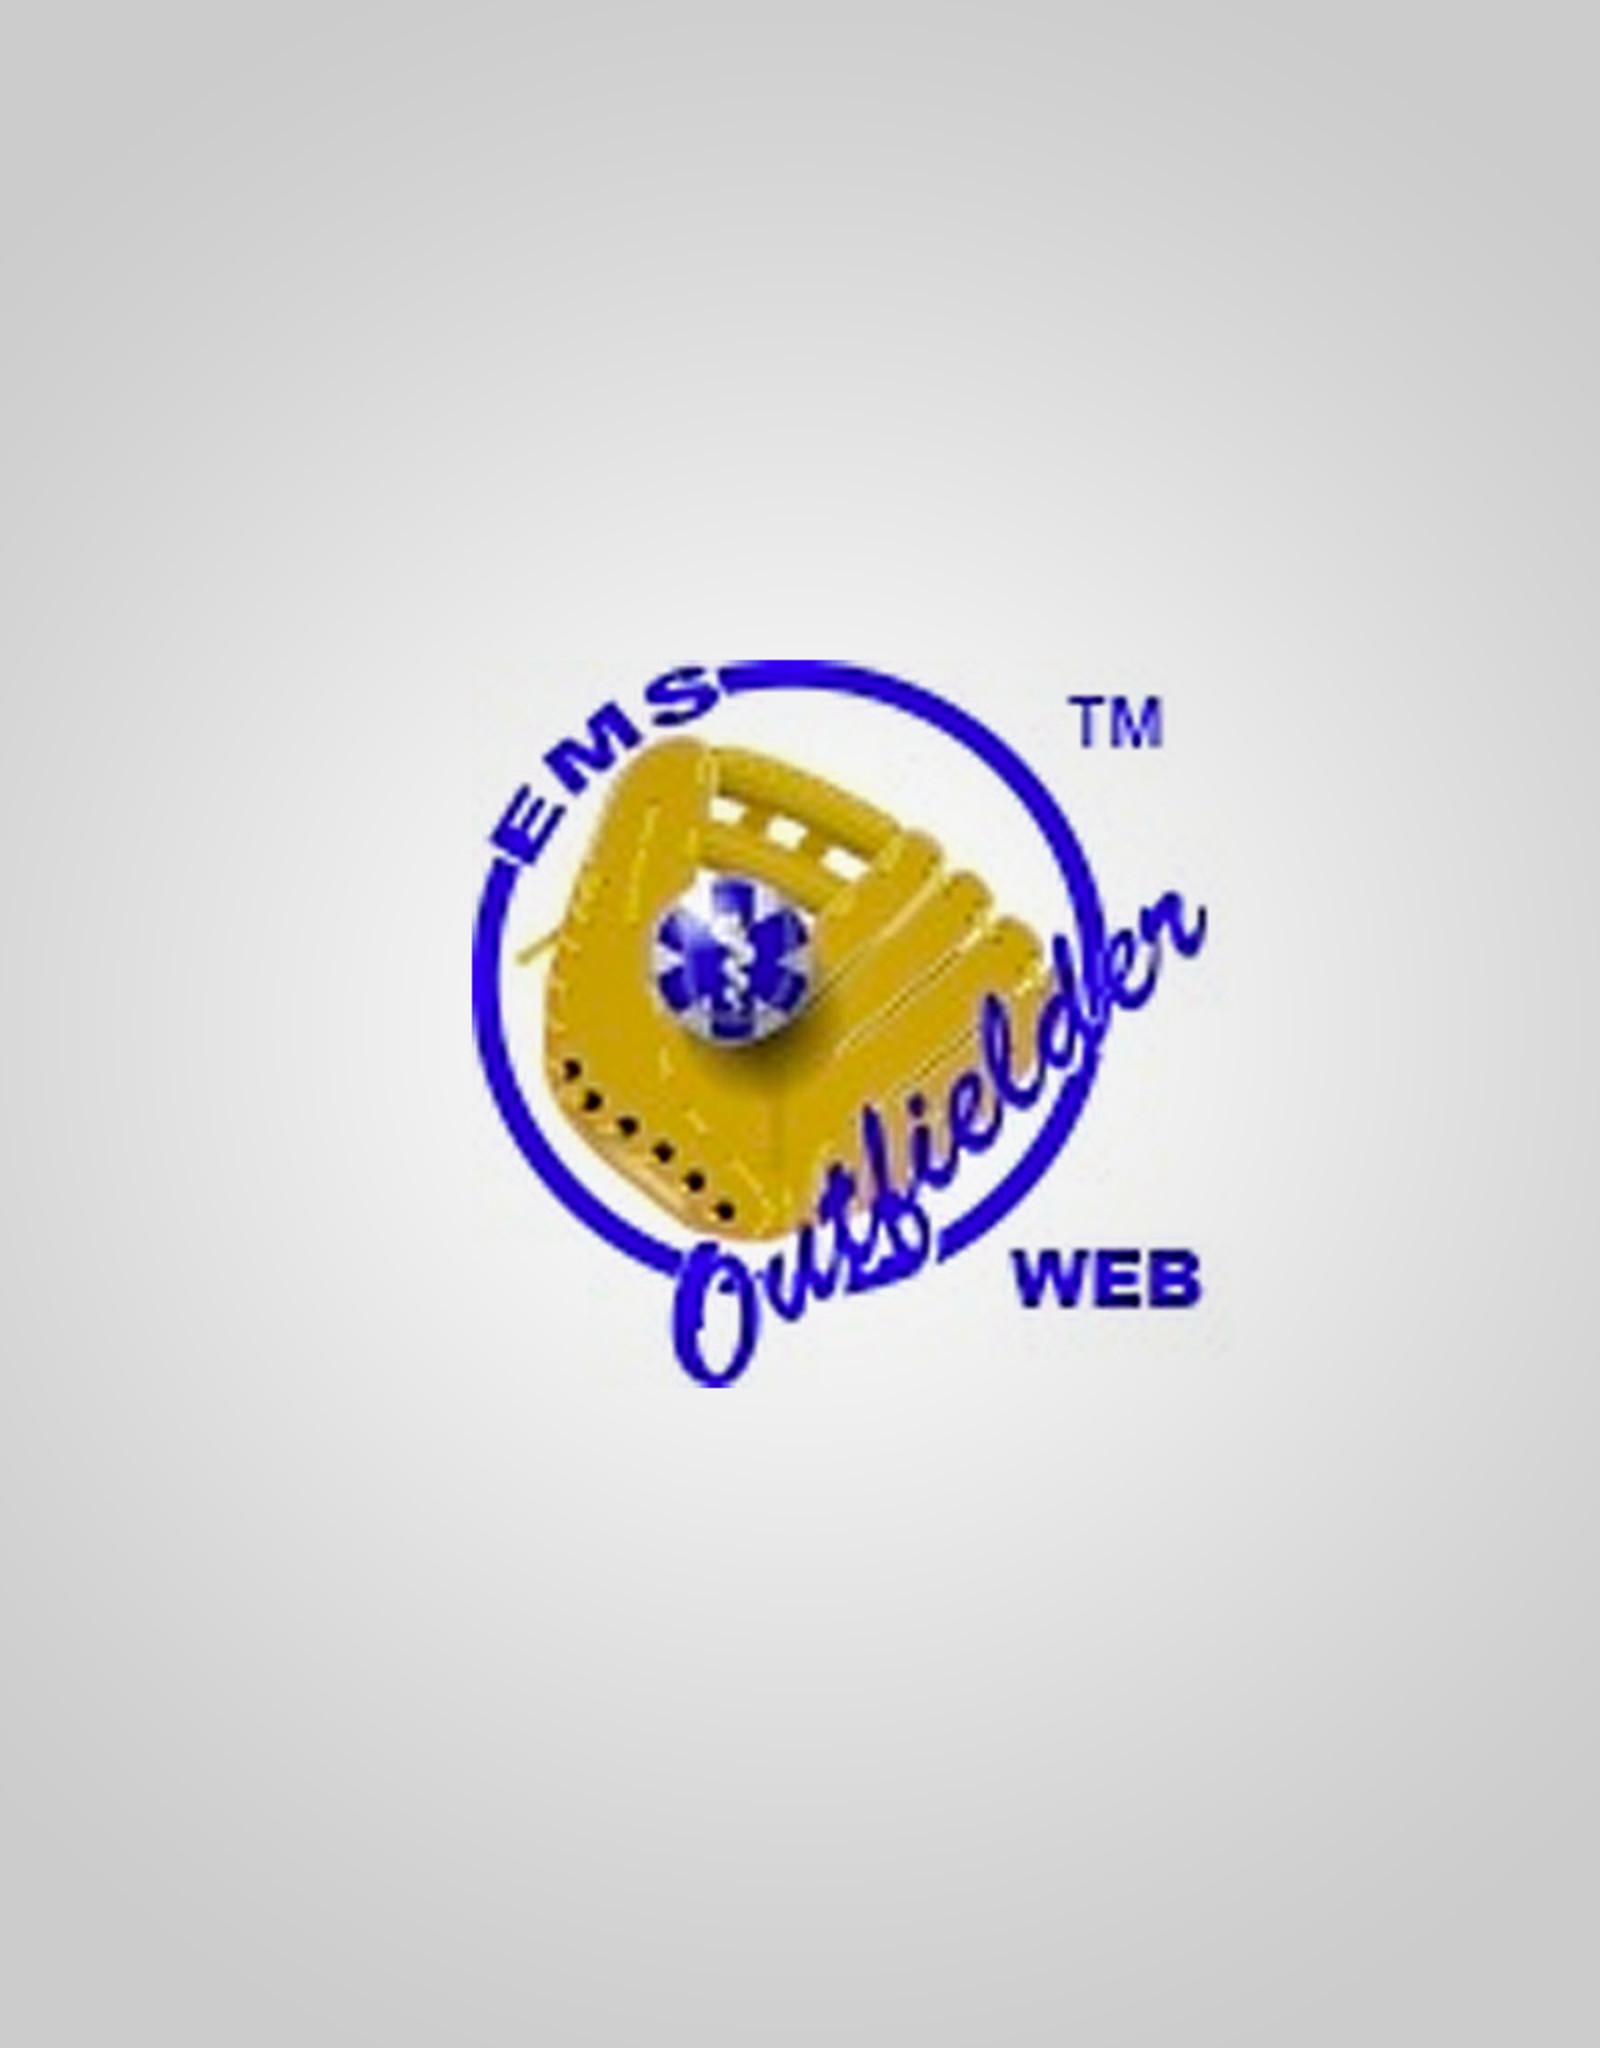 Inspironix Outfielder Web